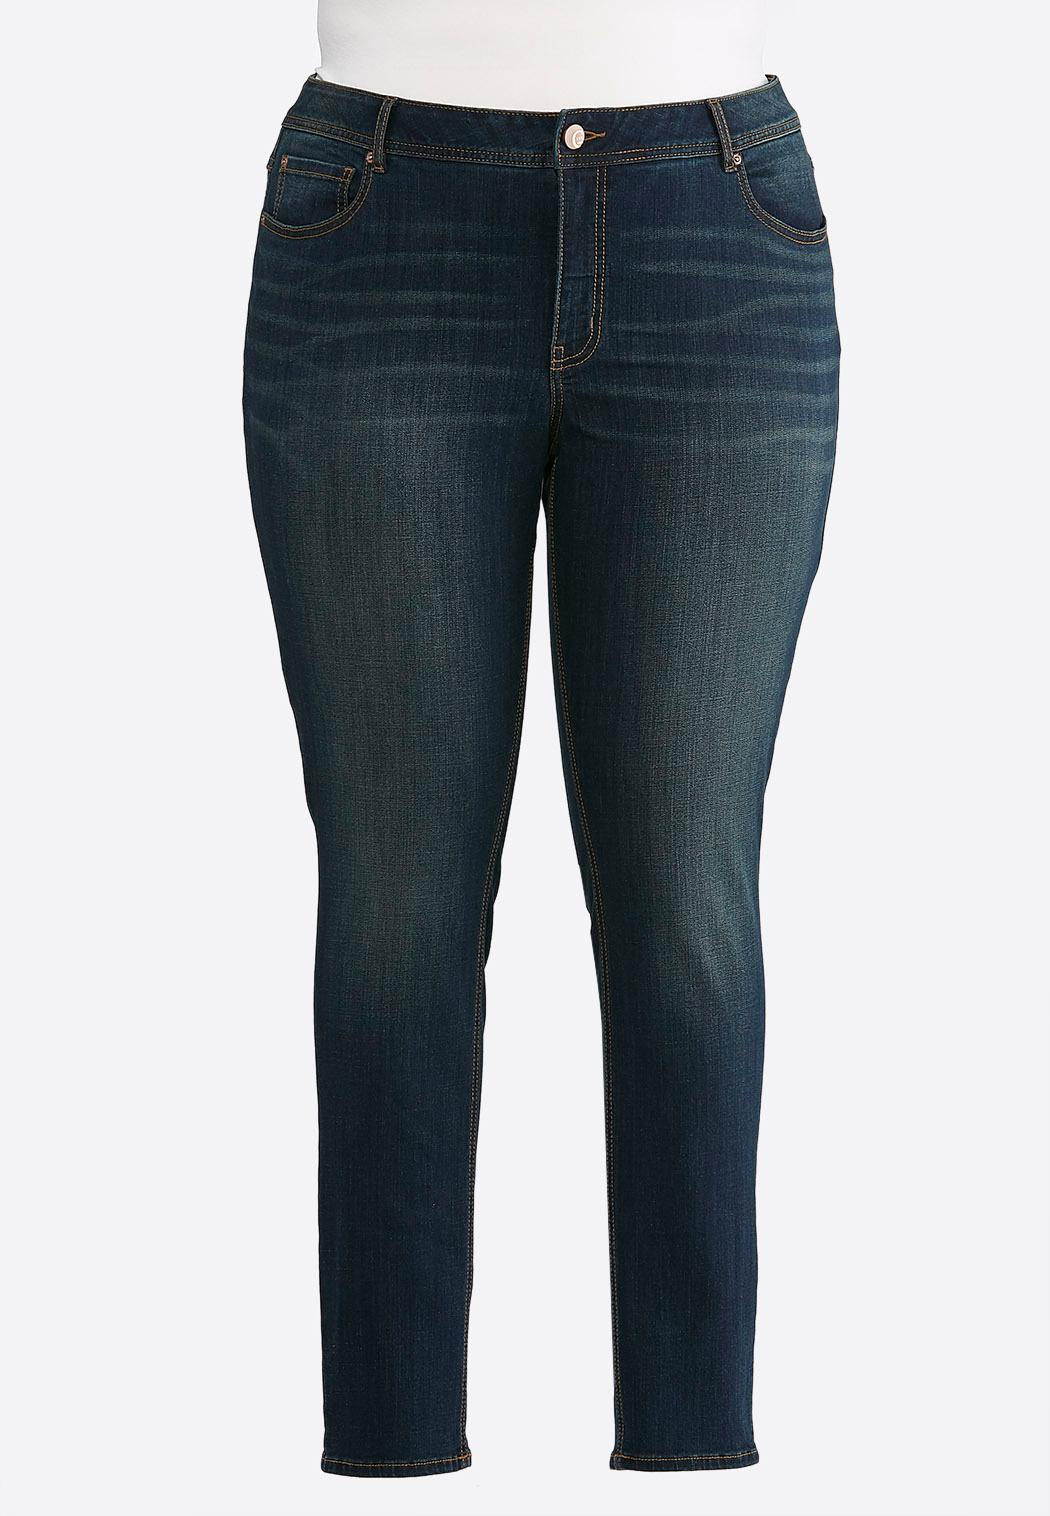 Plus Petite Curvy Rinse Wash Skinny Jeans